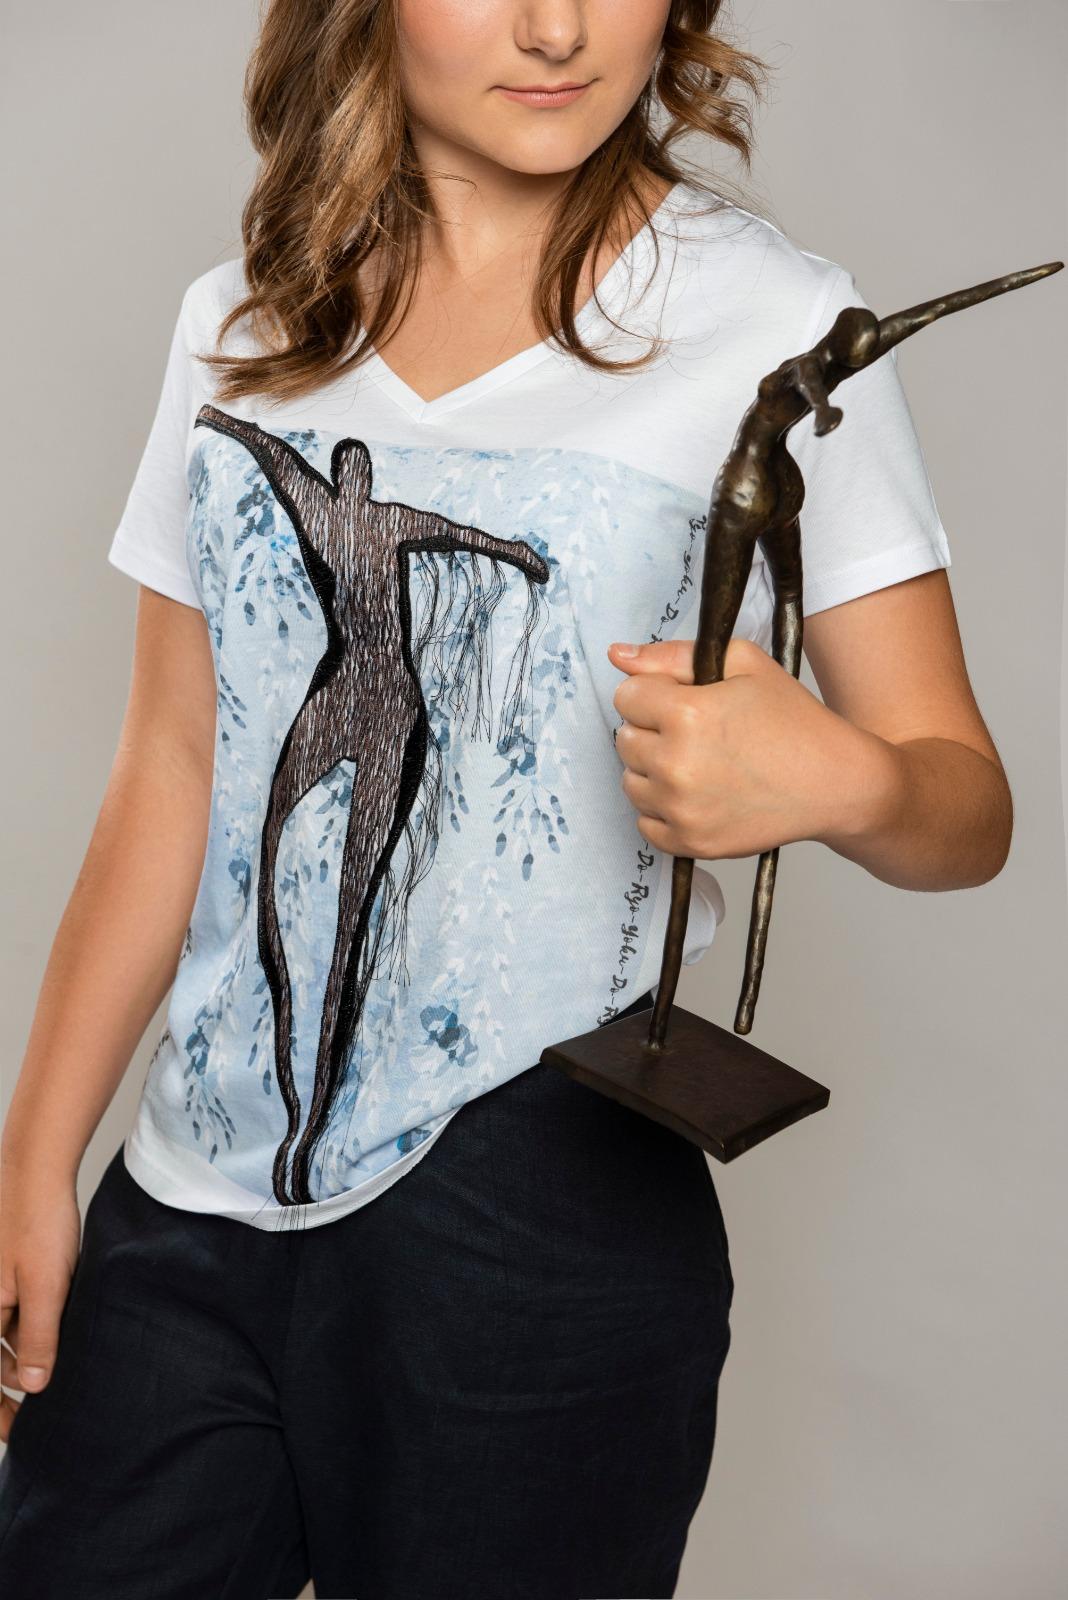 T-Shirts 'Freude des Lebens'